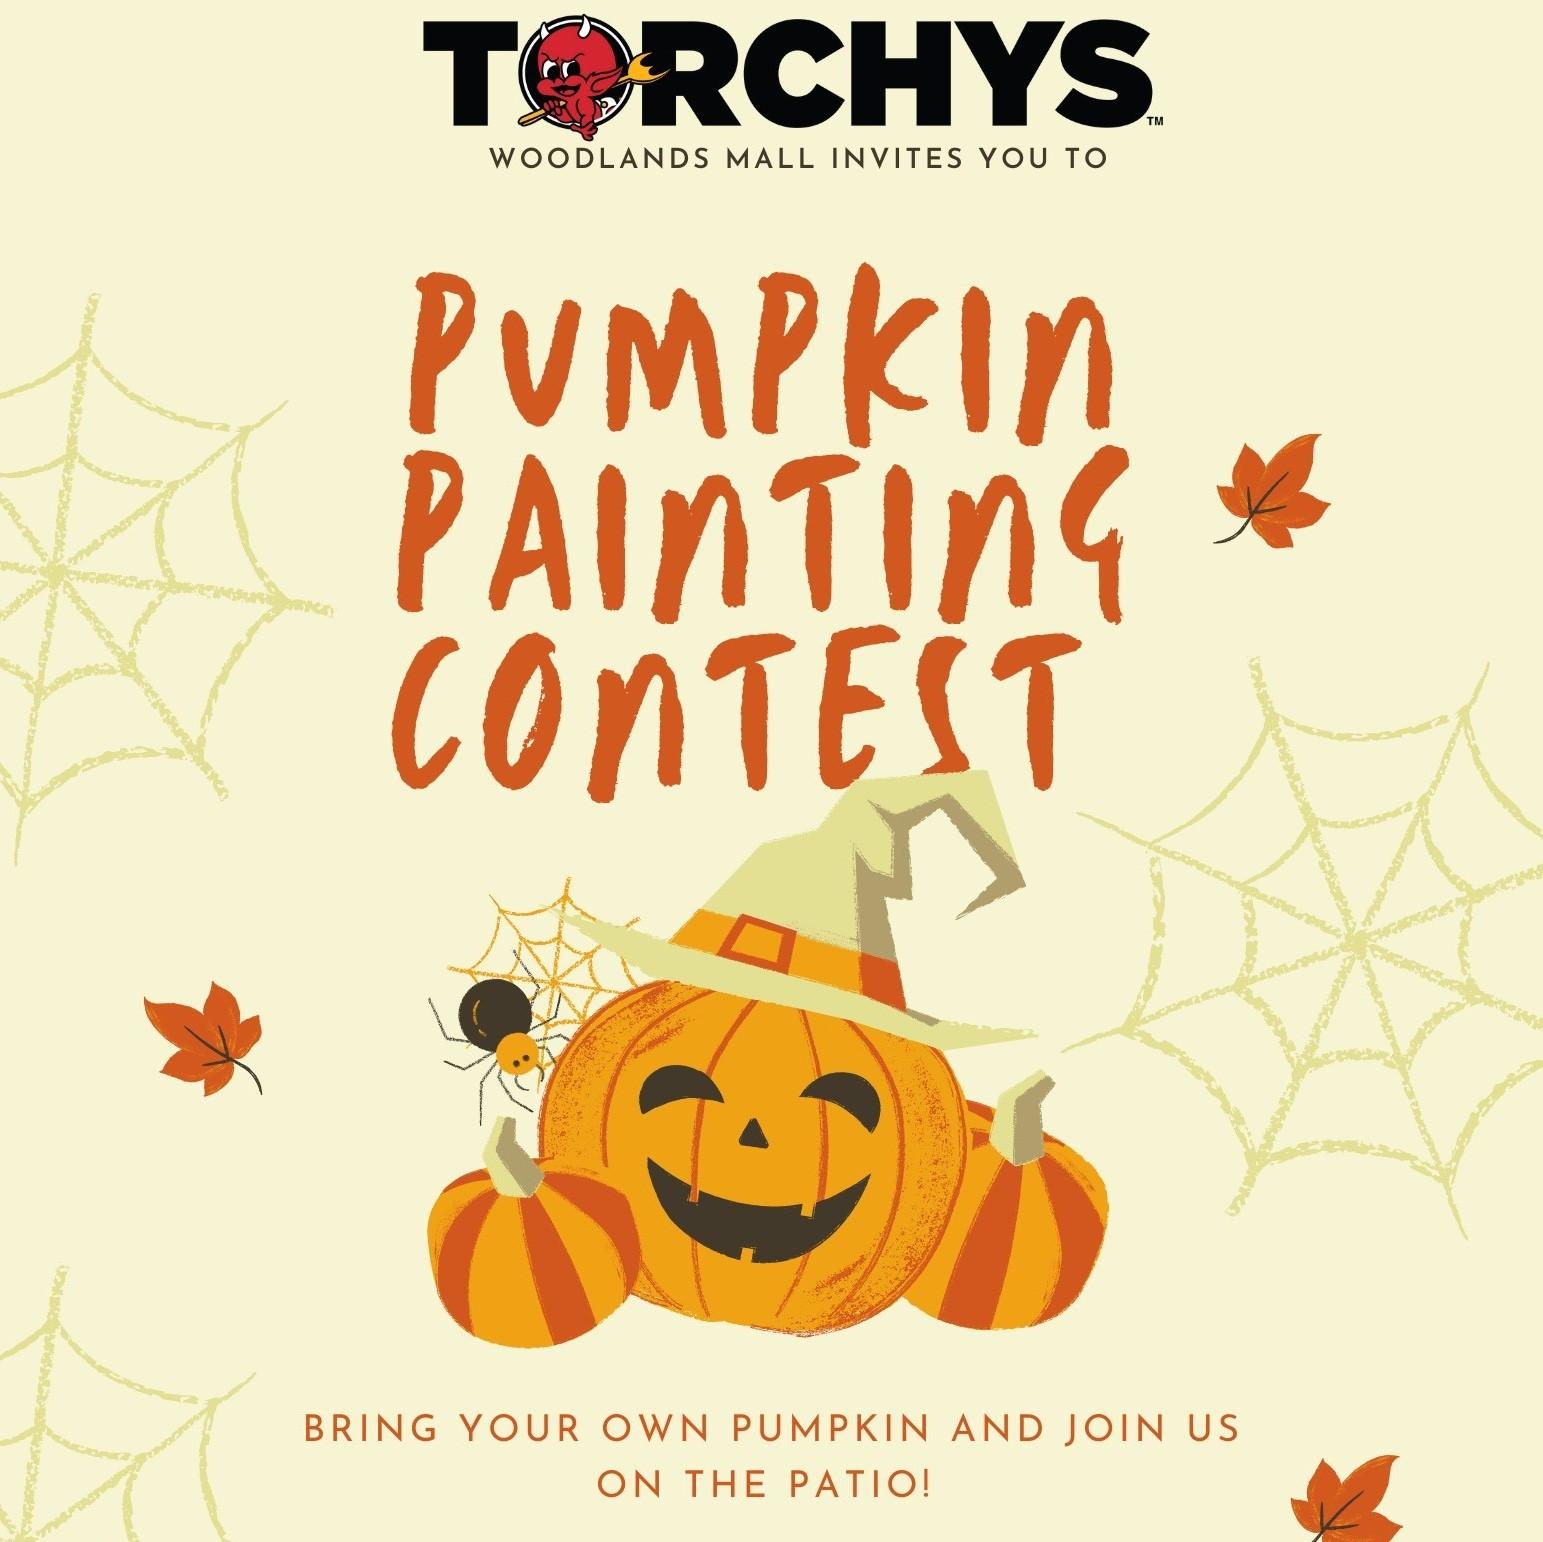 Pumpkin Painting Contest